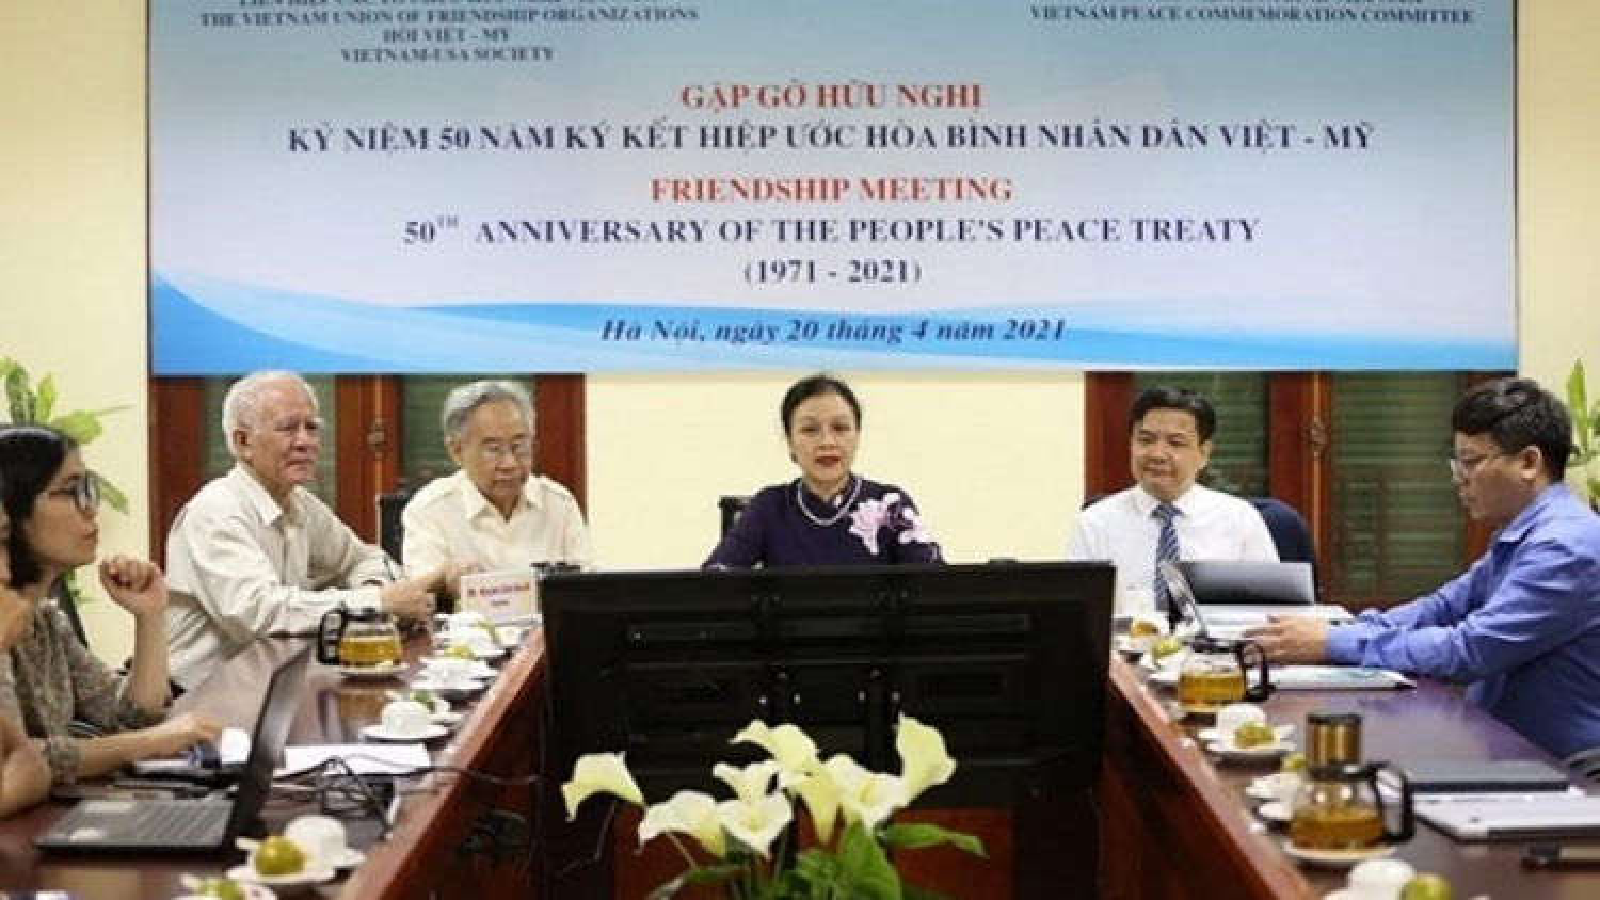 Gathering marks 50 years of Vietnam - US People's Peace Treaty